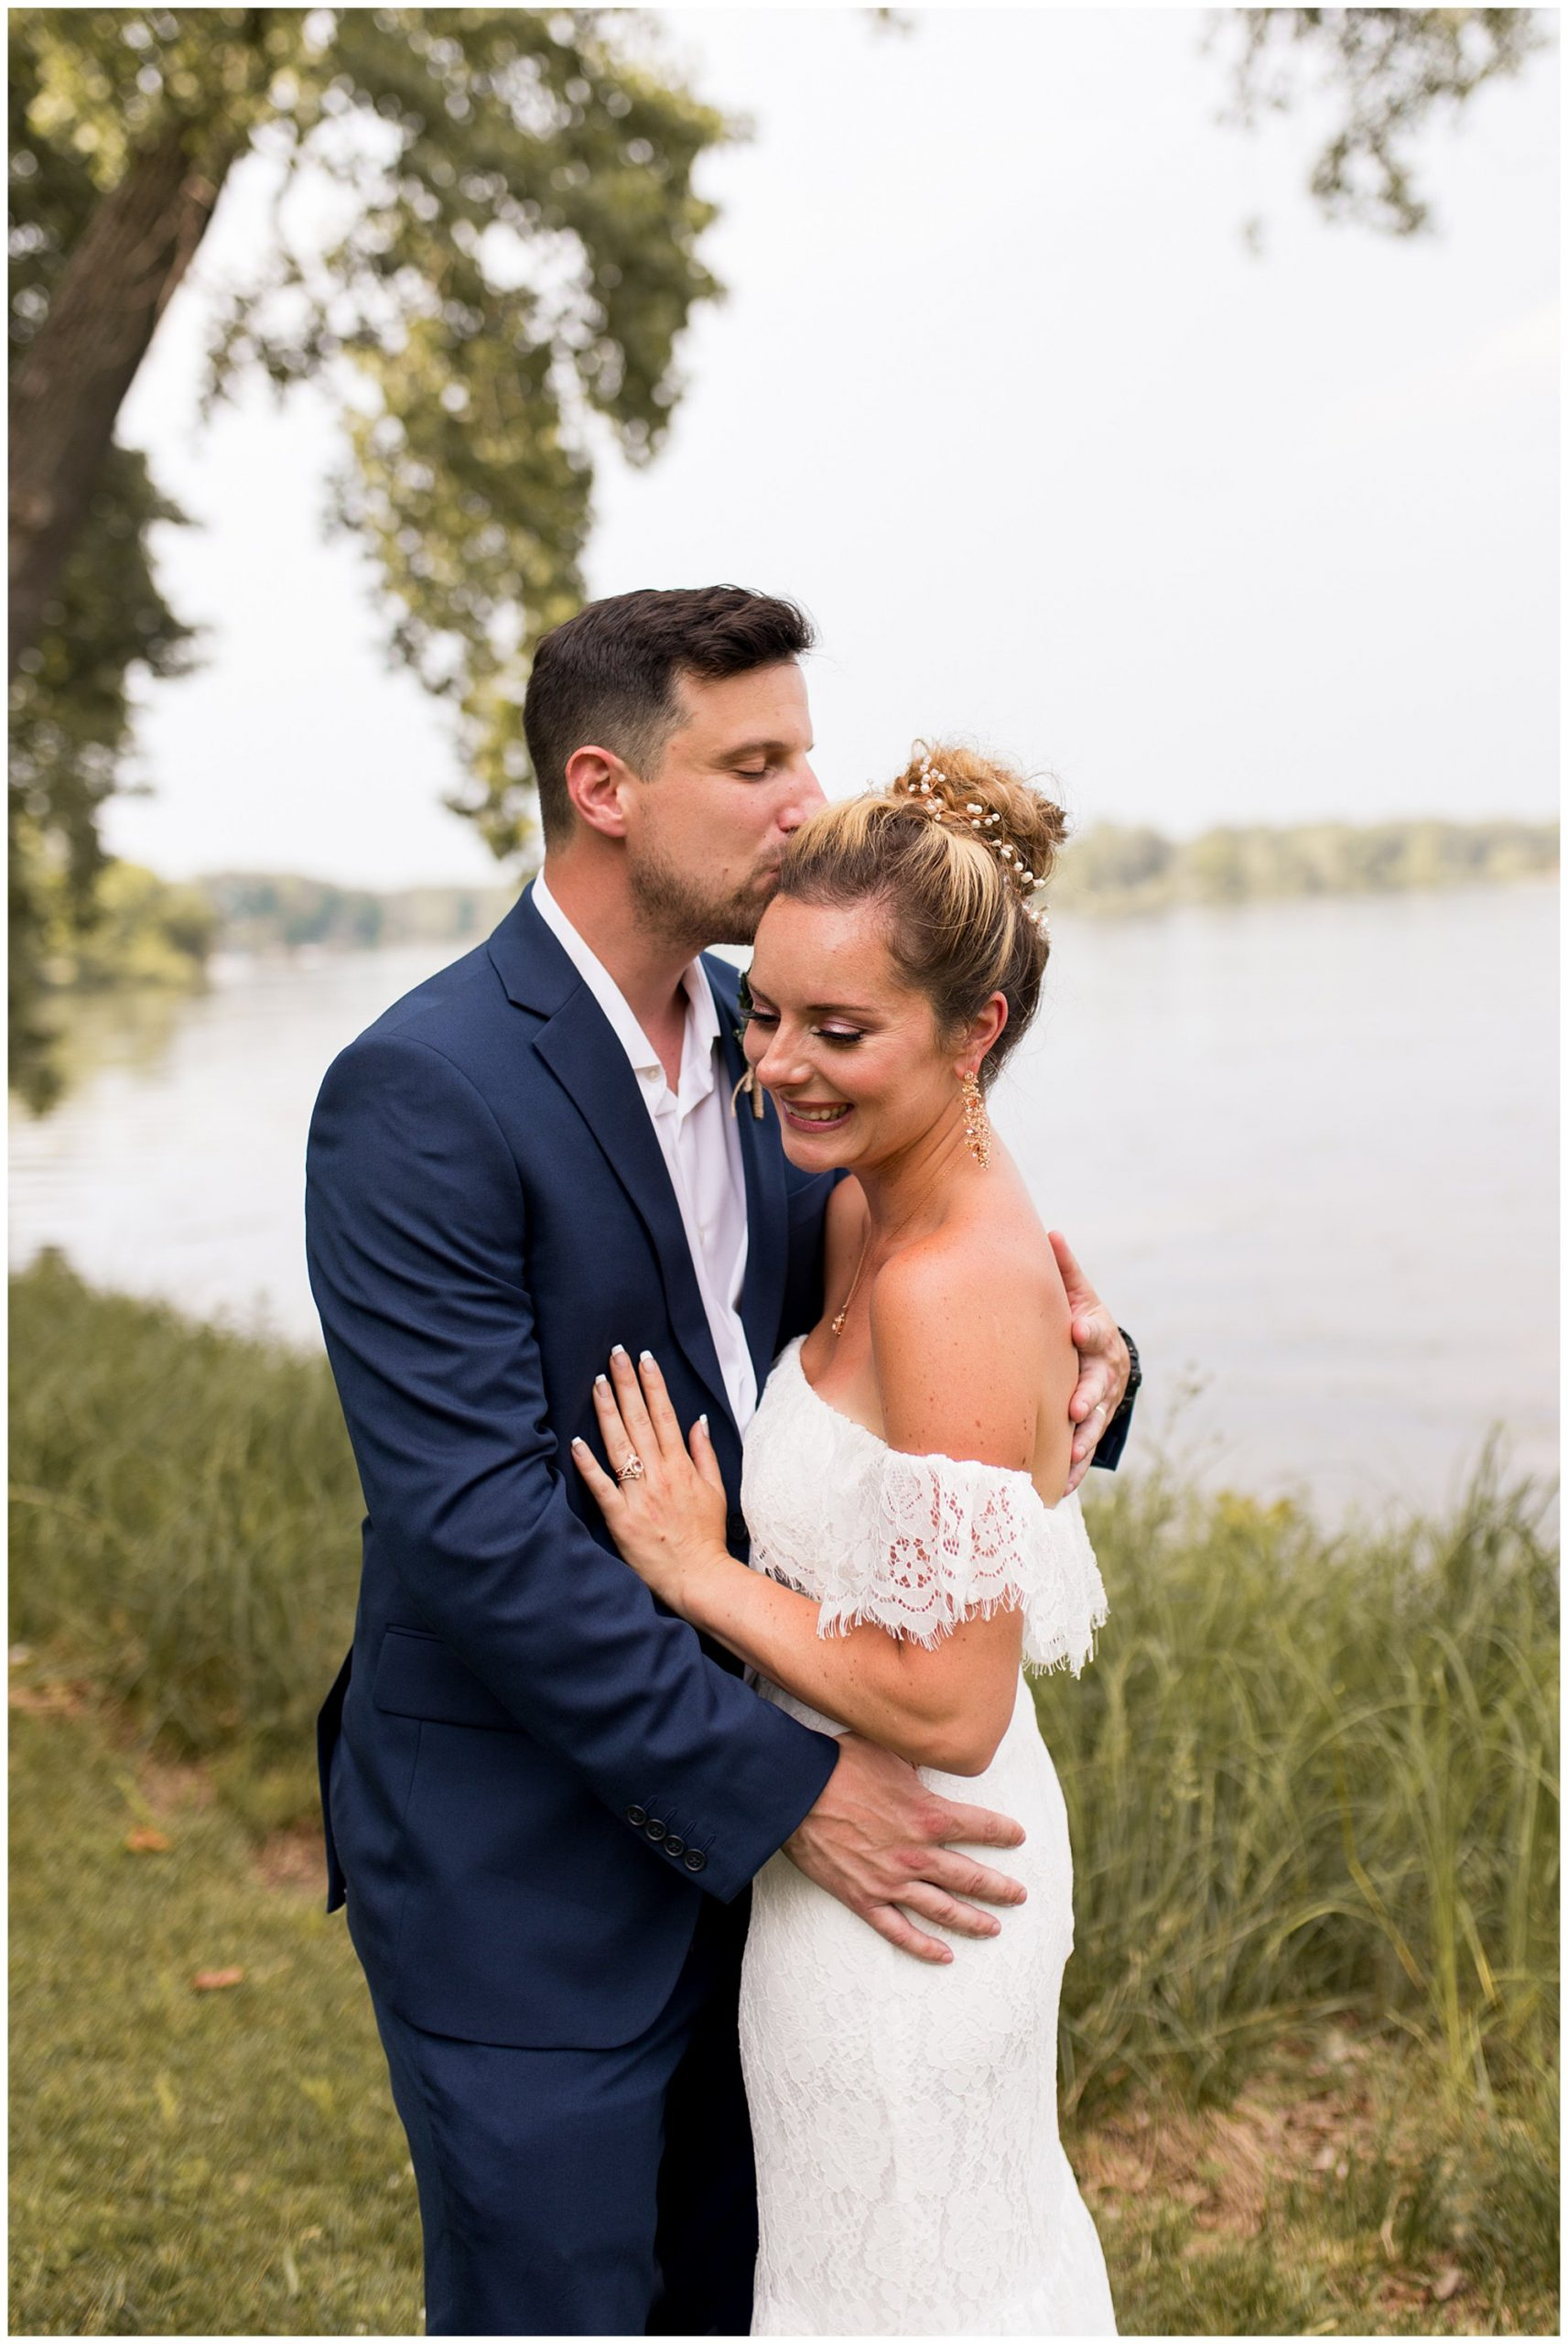 bride and groom after summer wedding at Lucerne Park in Warsaw Indiana